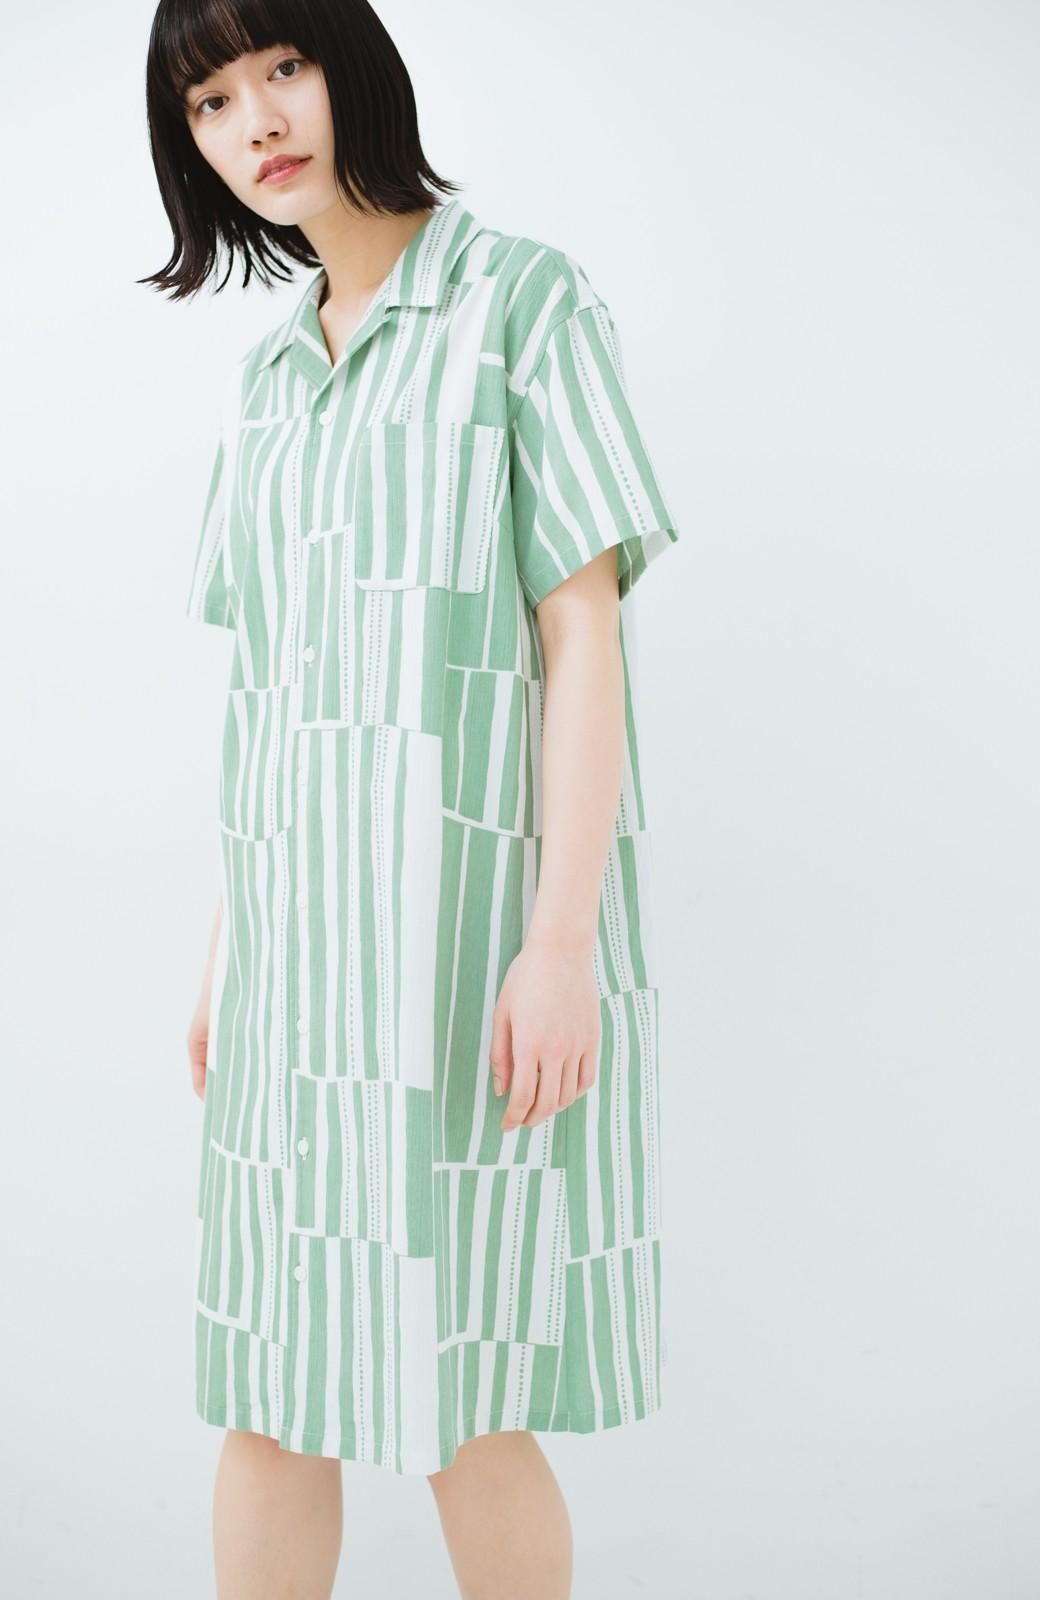 haco! 京都の浴衣屋さんと作った浴衣生地のシャツワンピース <グリーン系その他>の商品写真17